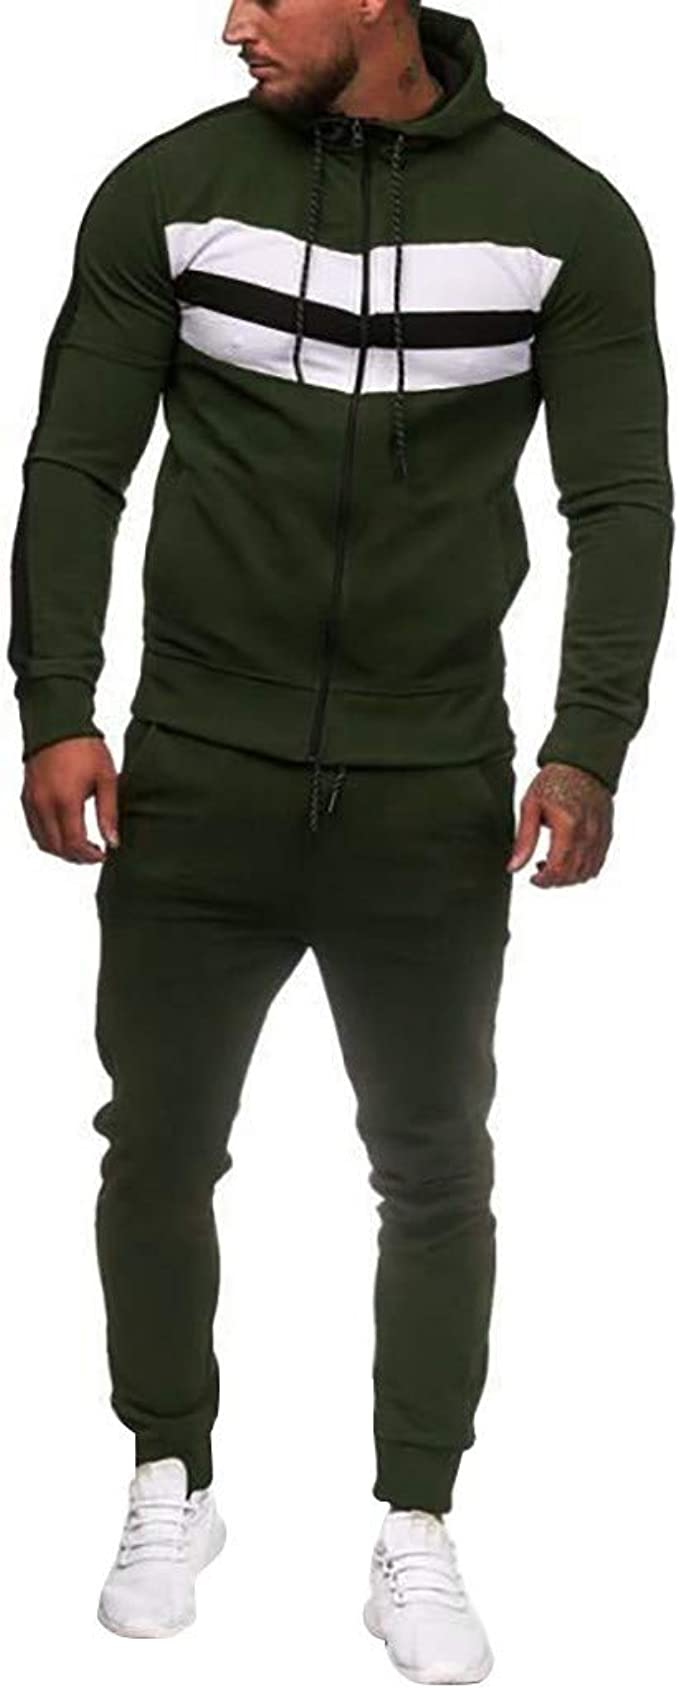 Whitive Men Slim-Fit Zip Up 2 Piece Stand Up Collar Active Tracksuit Jog Set